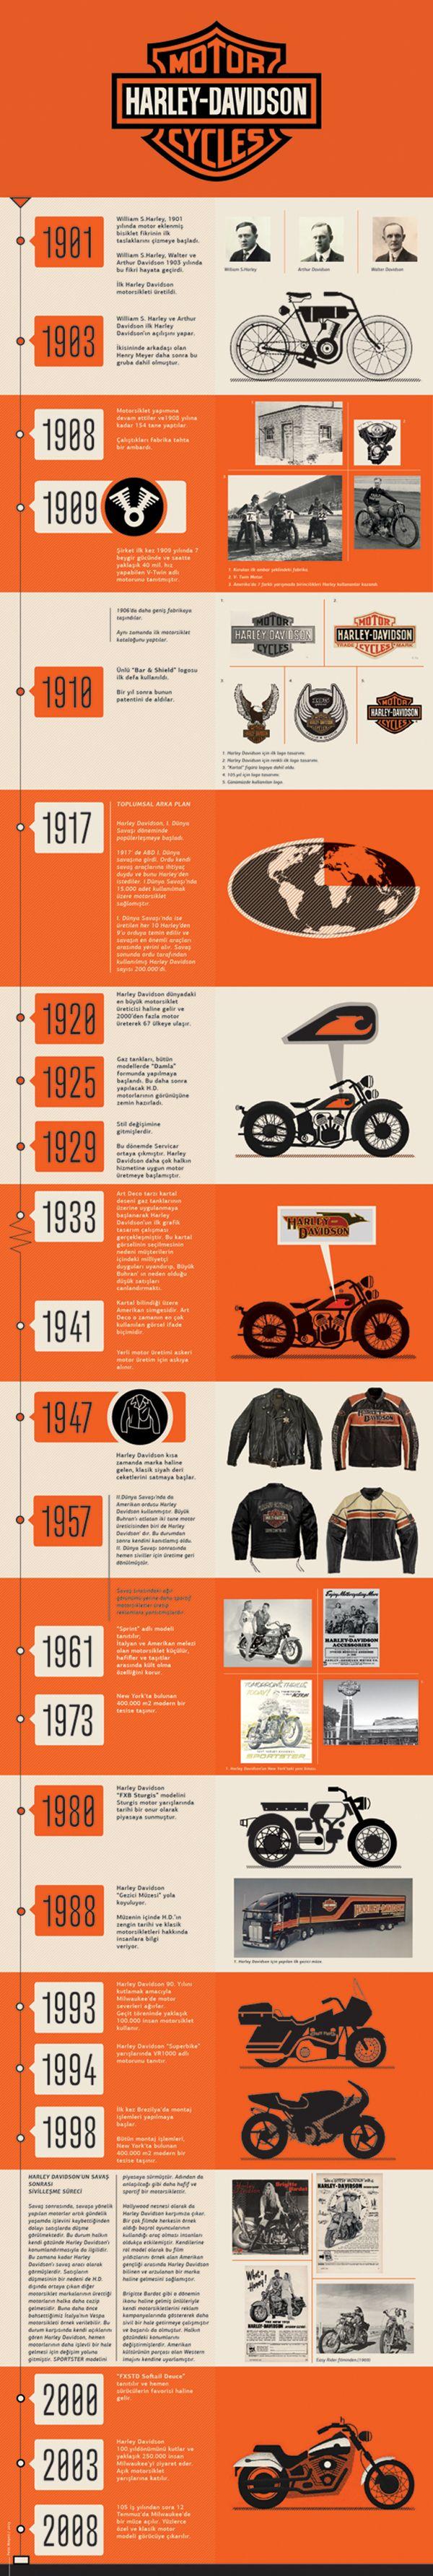 Harley Davidson History of Timeline Design by Pelin Meşeci , via Behance